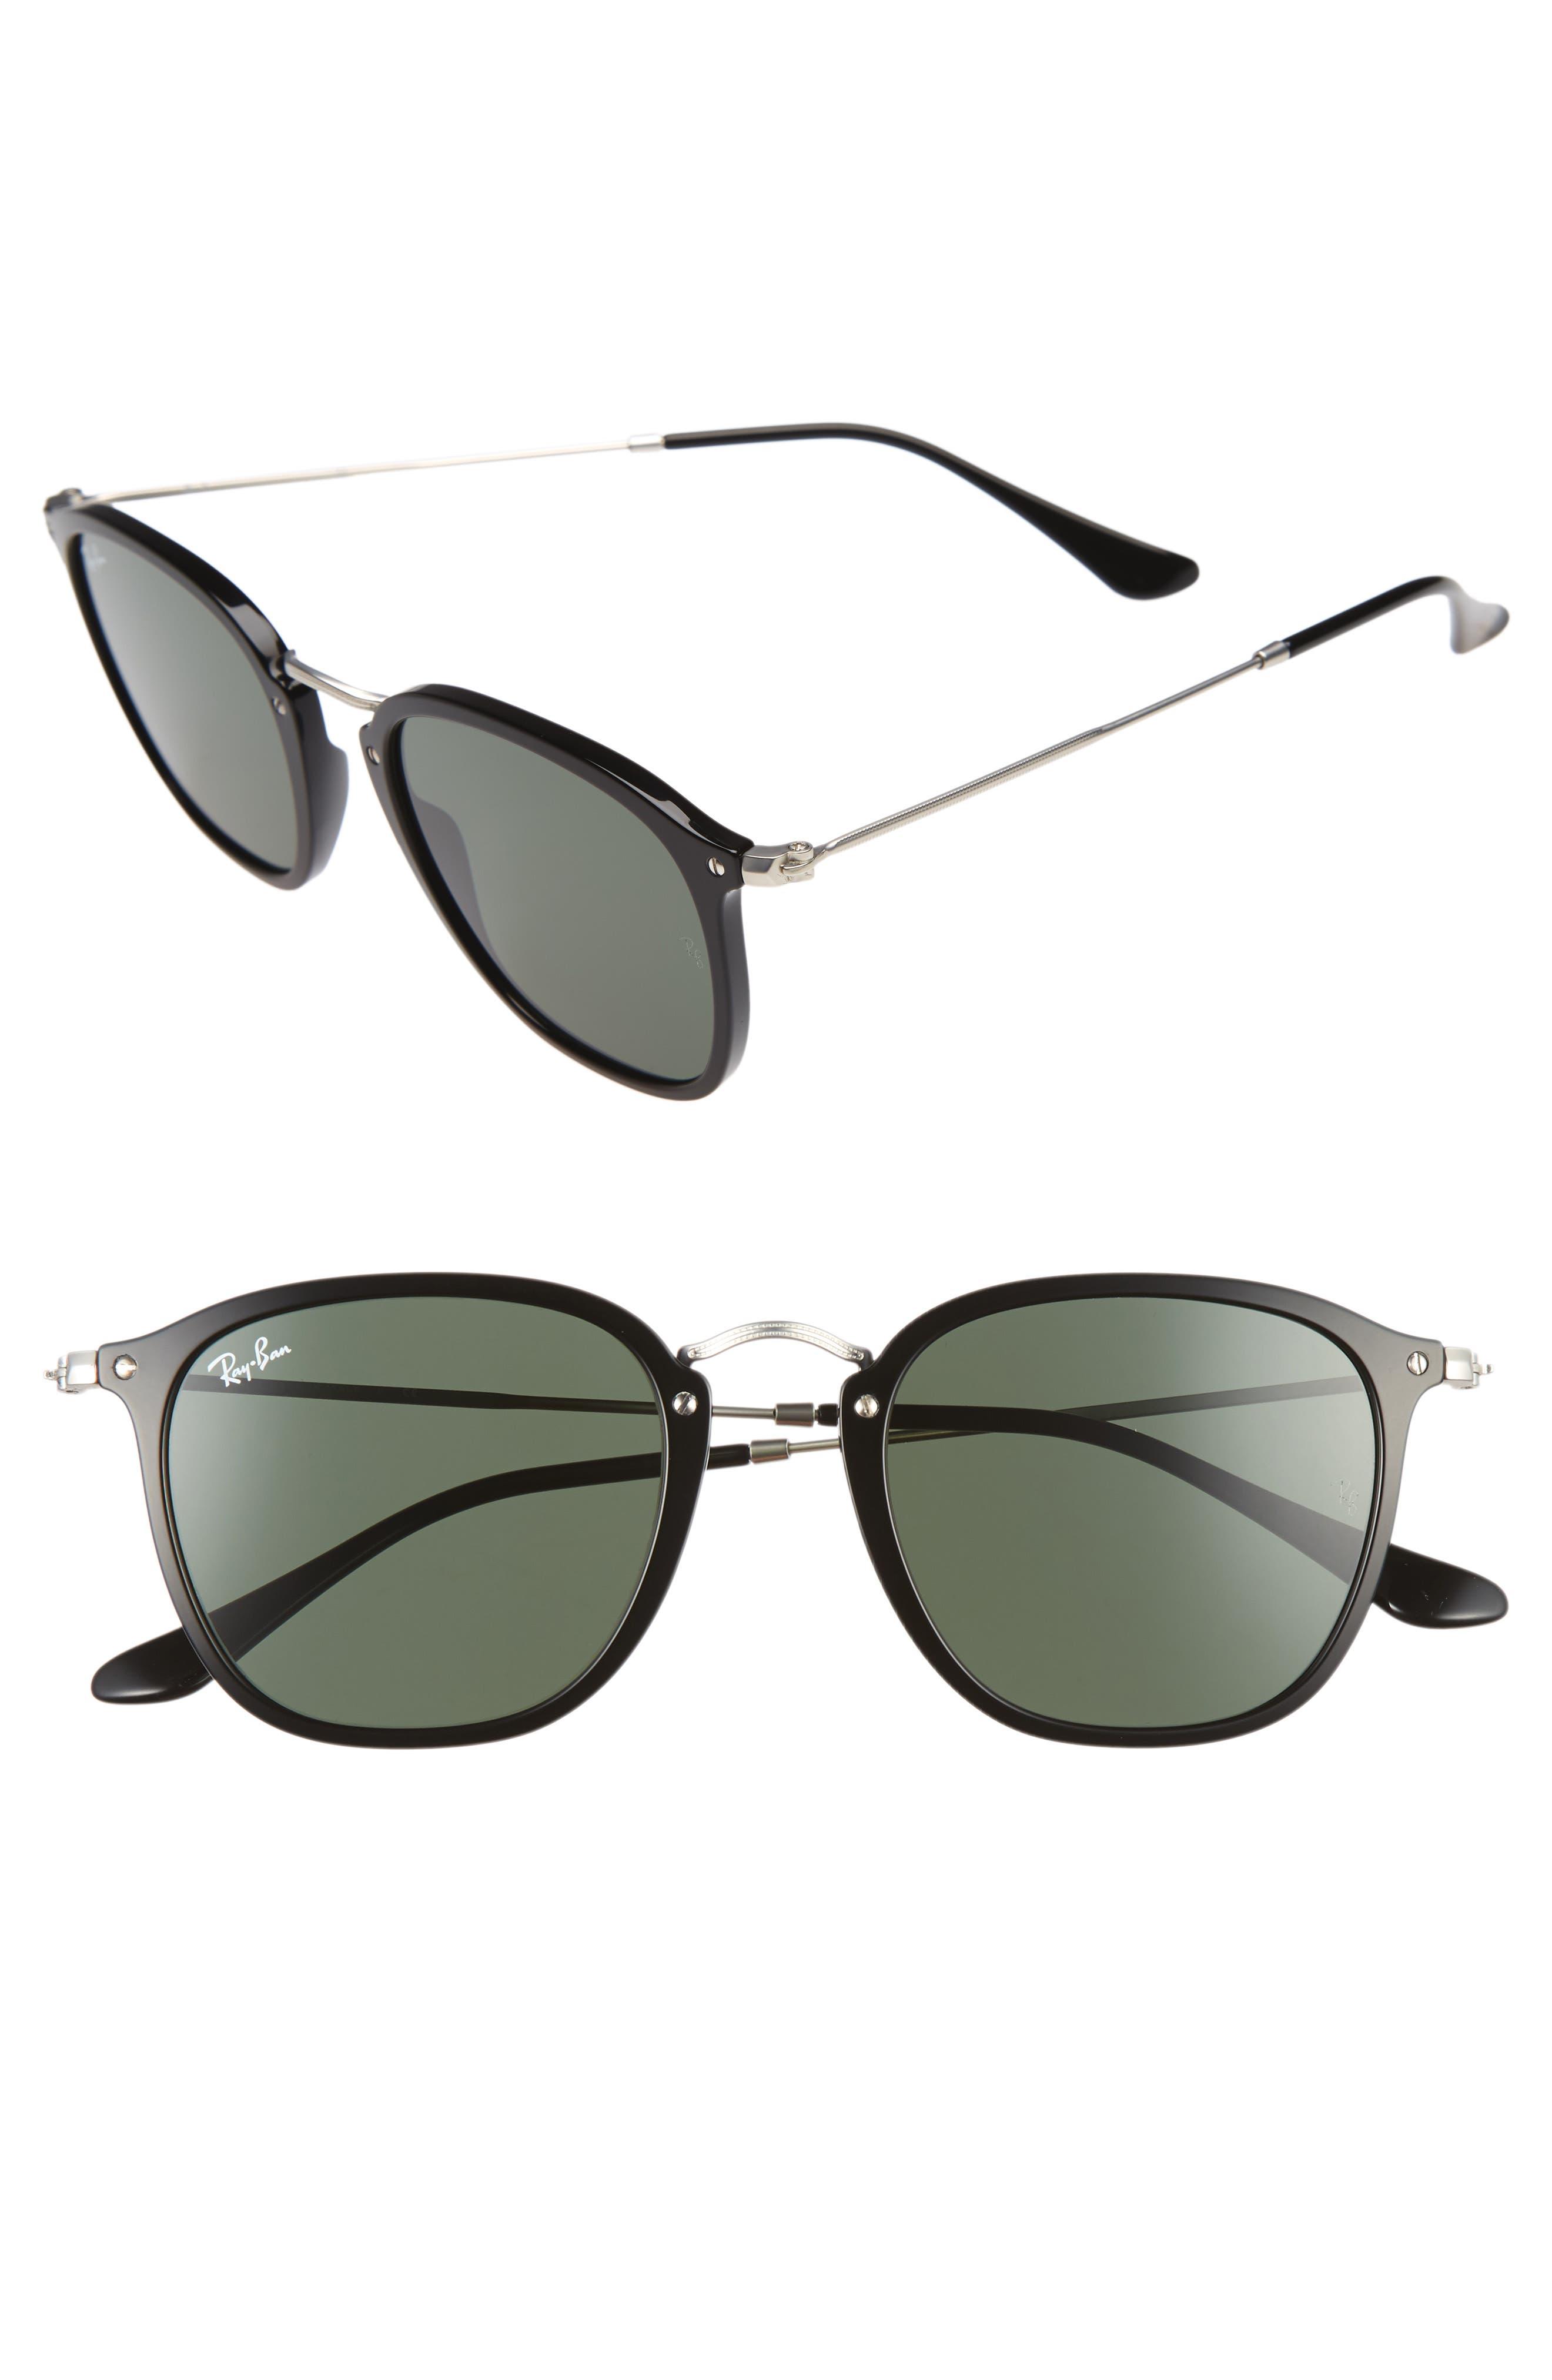 Icons 51mm Aviator Sunglasses,                             Main thumbnail 1, color,                             Black